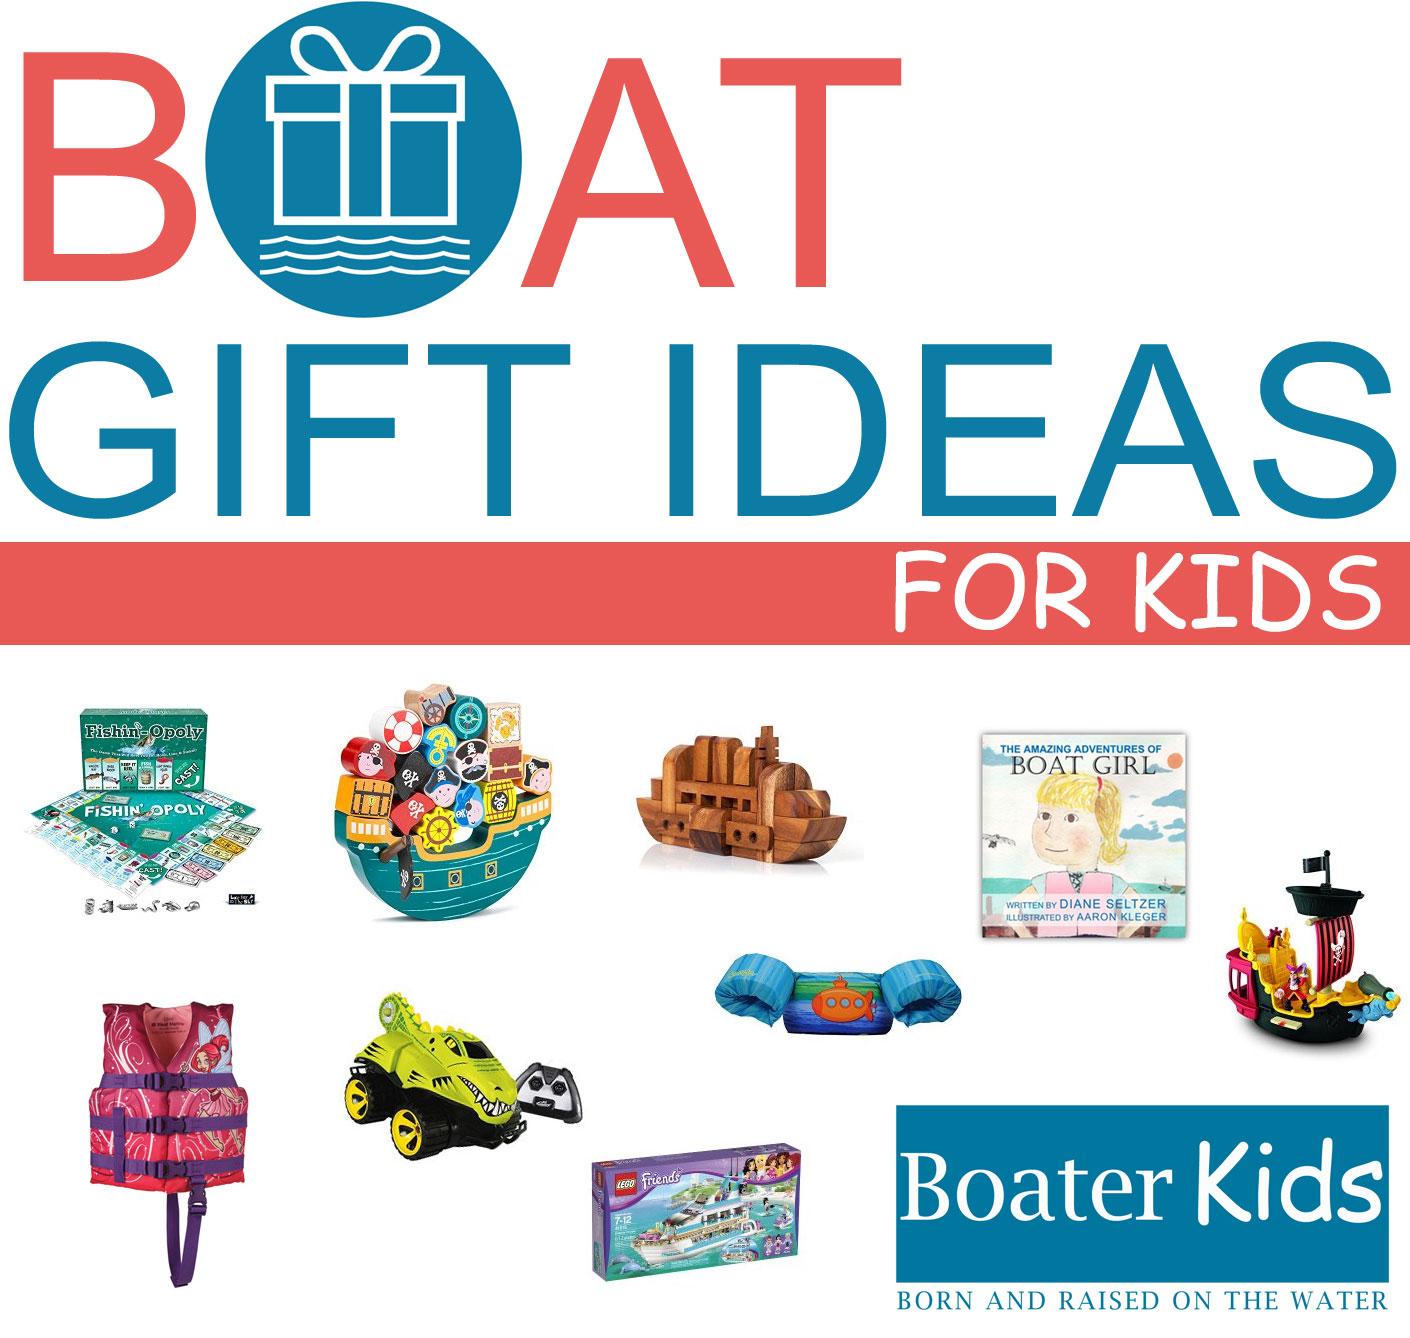 boating gift ideas for kids | boater kids